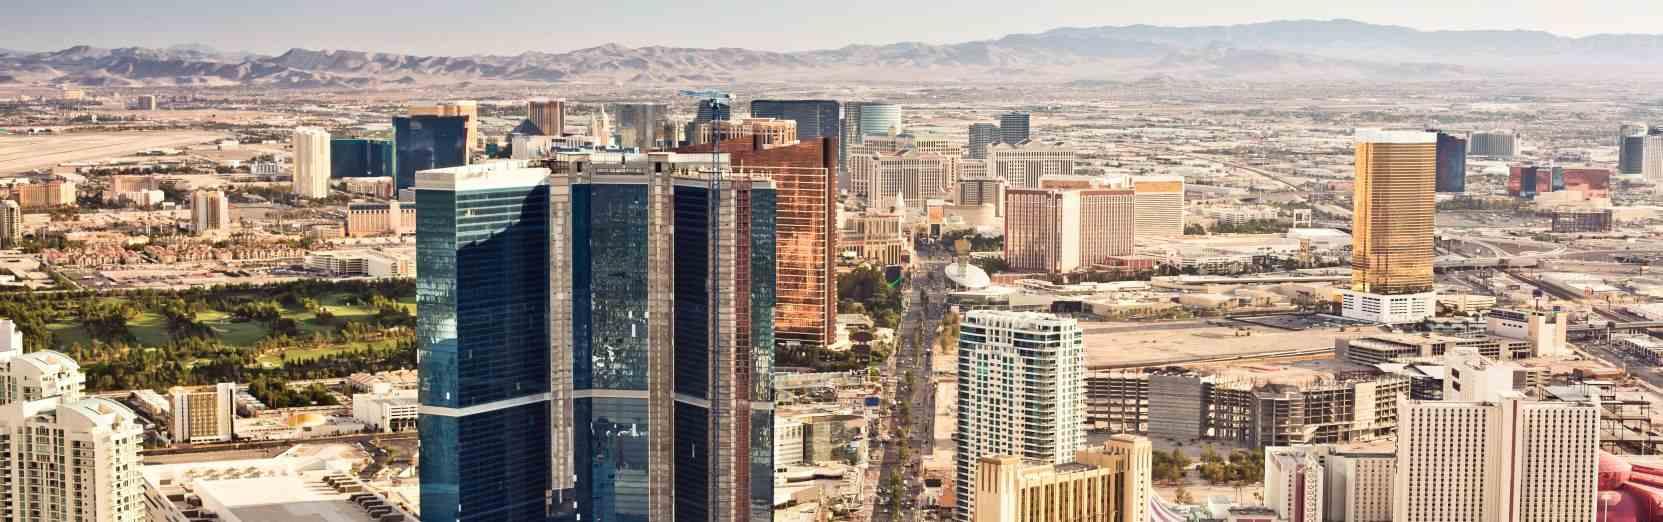 Reise Nach Las Vegas Sunny Cars Autovermietung